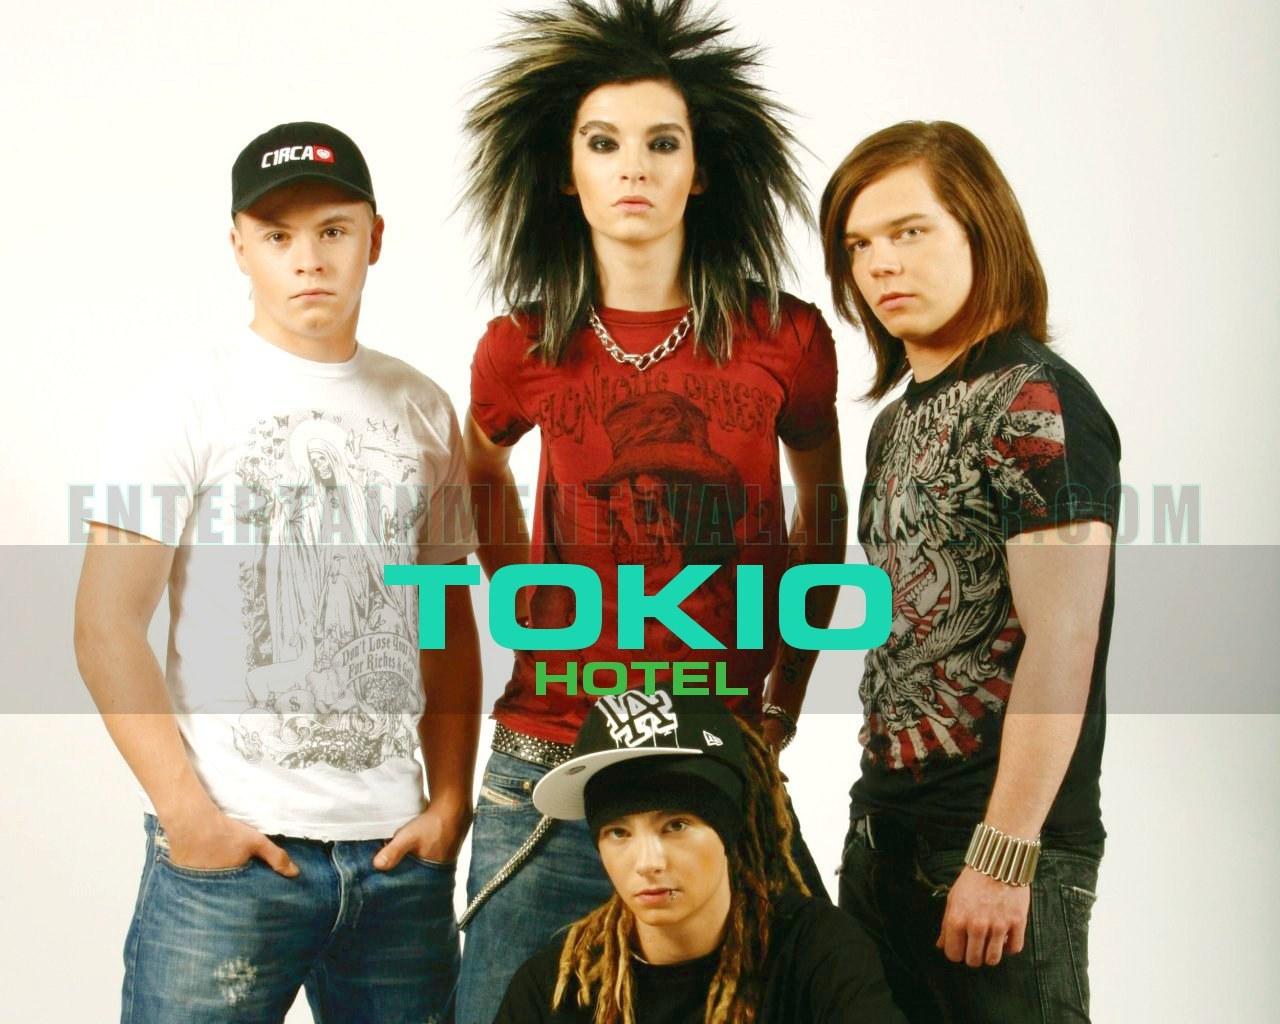 Tokio Hotel Wallpaper Tokio Hotel 502908 Hd Wallpaper Backgrounds Download